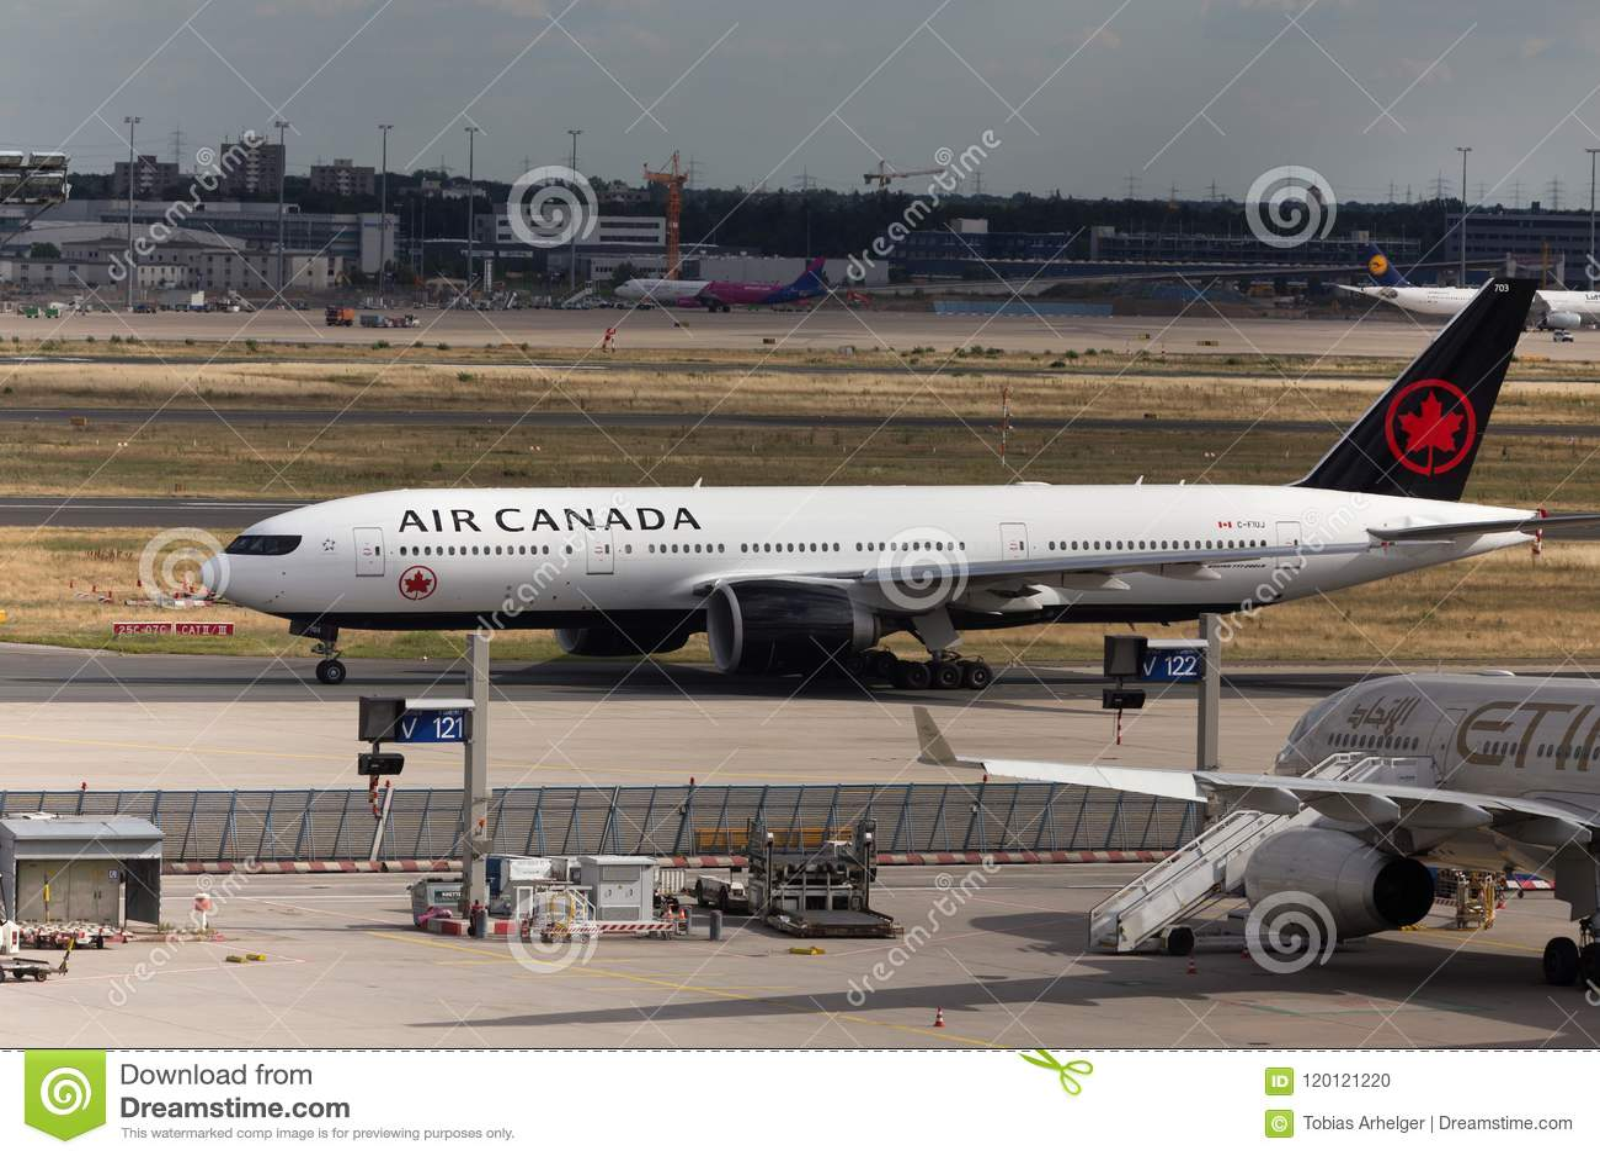 Frankfurt, hesse/germany - 25 06 18: air canada airplane landing at frankfurt airport germany